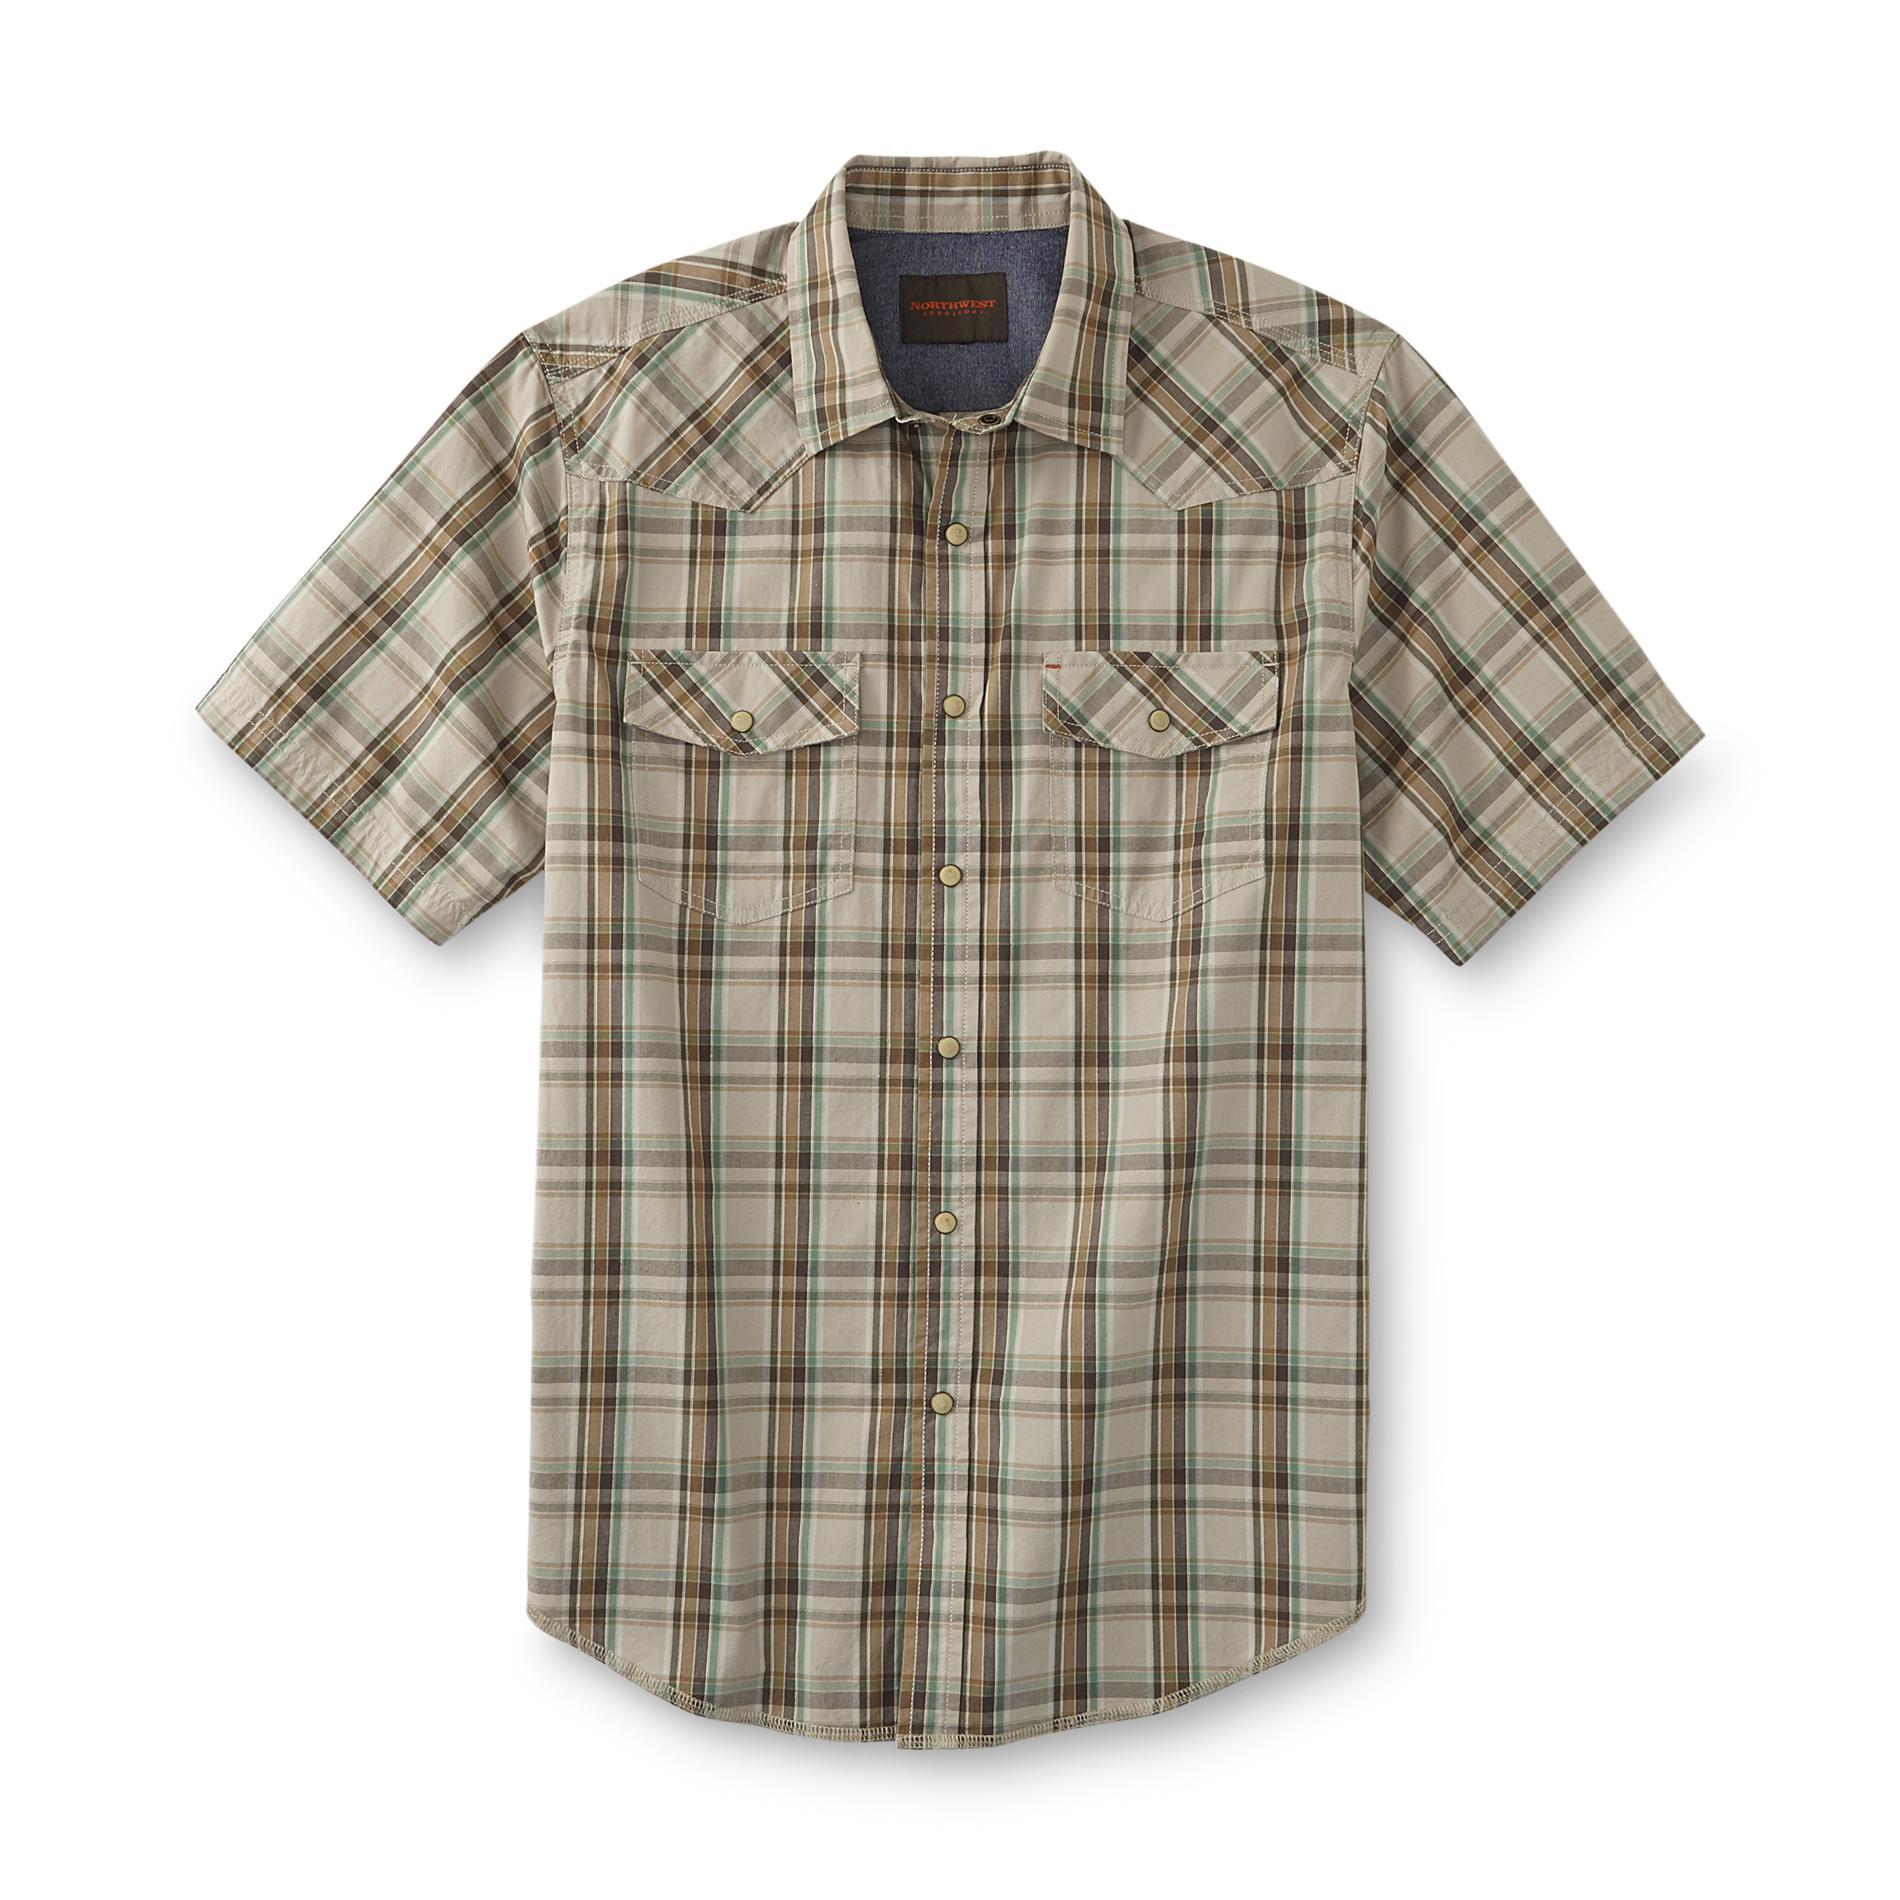 Northwest Territory Men's Big & Tall Western Shirt - Plaid